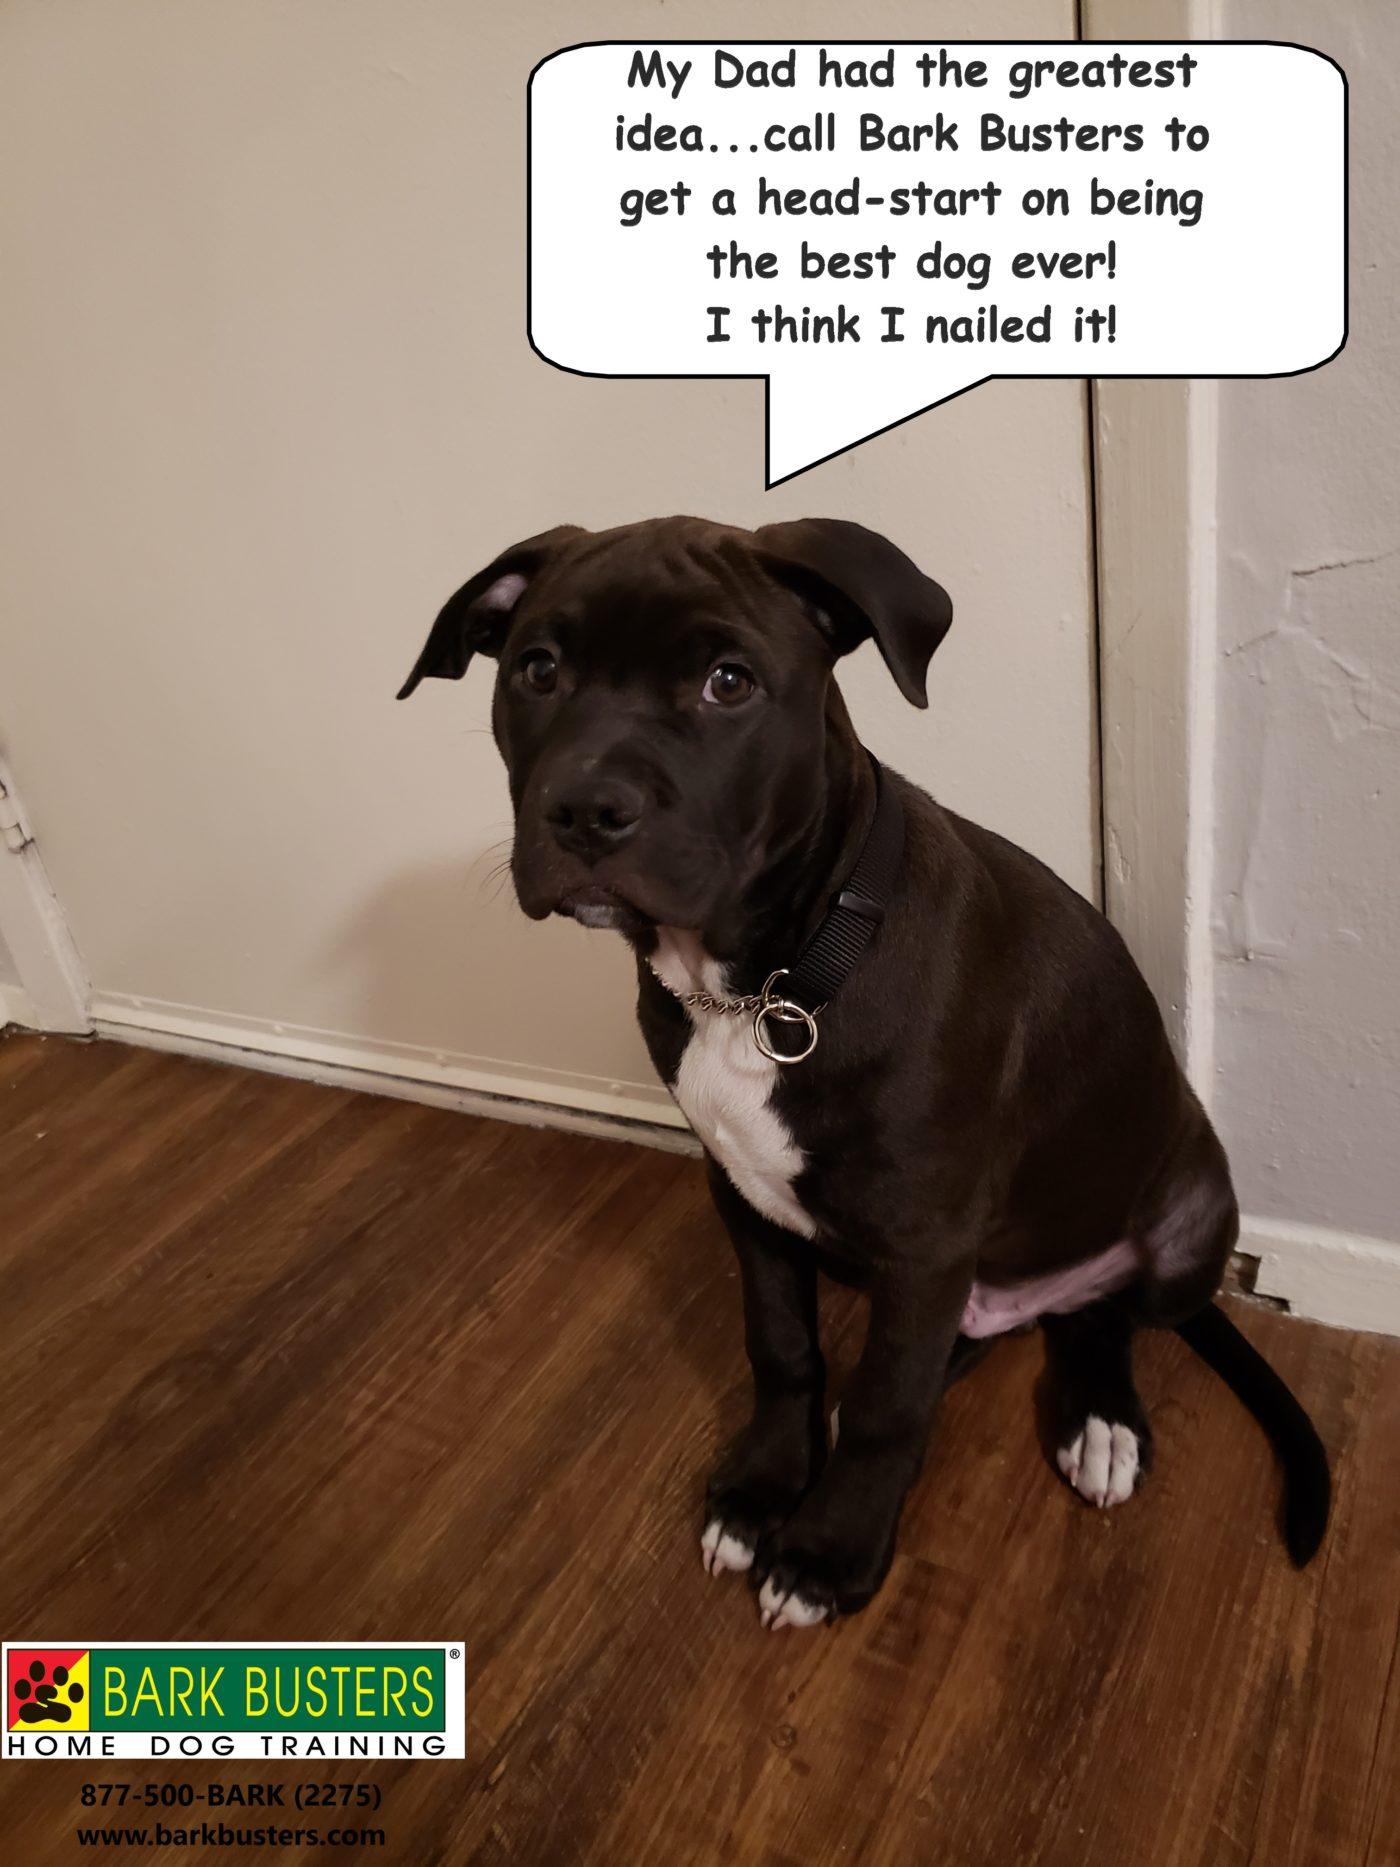 #pitbulldogtraining #bestdogtrainingroundrock #dogsofbarkbusters #bestdogtrainingeastaustin